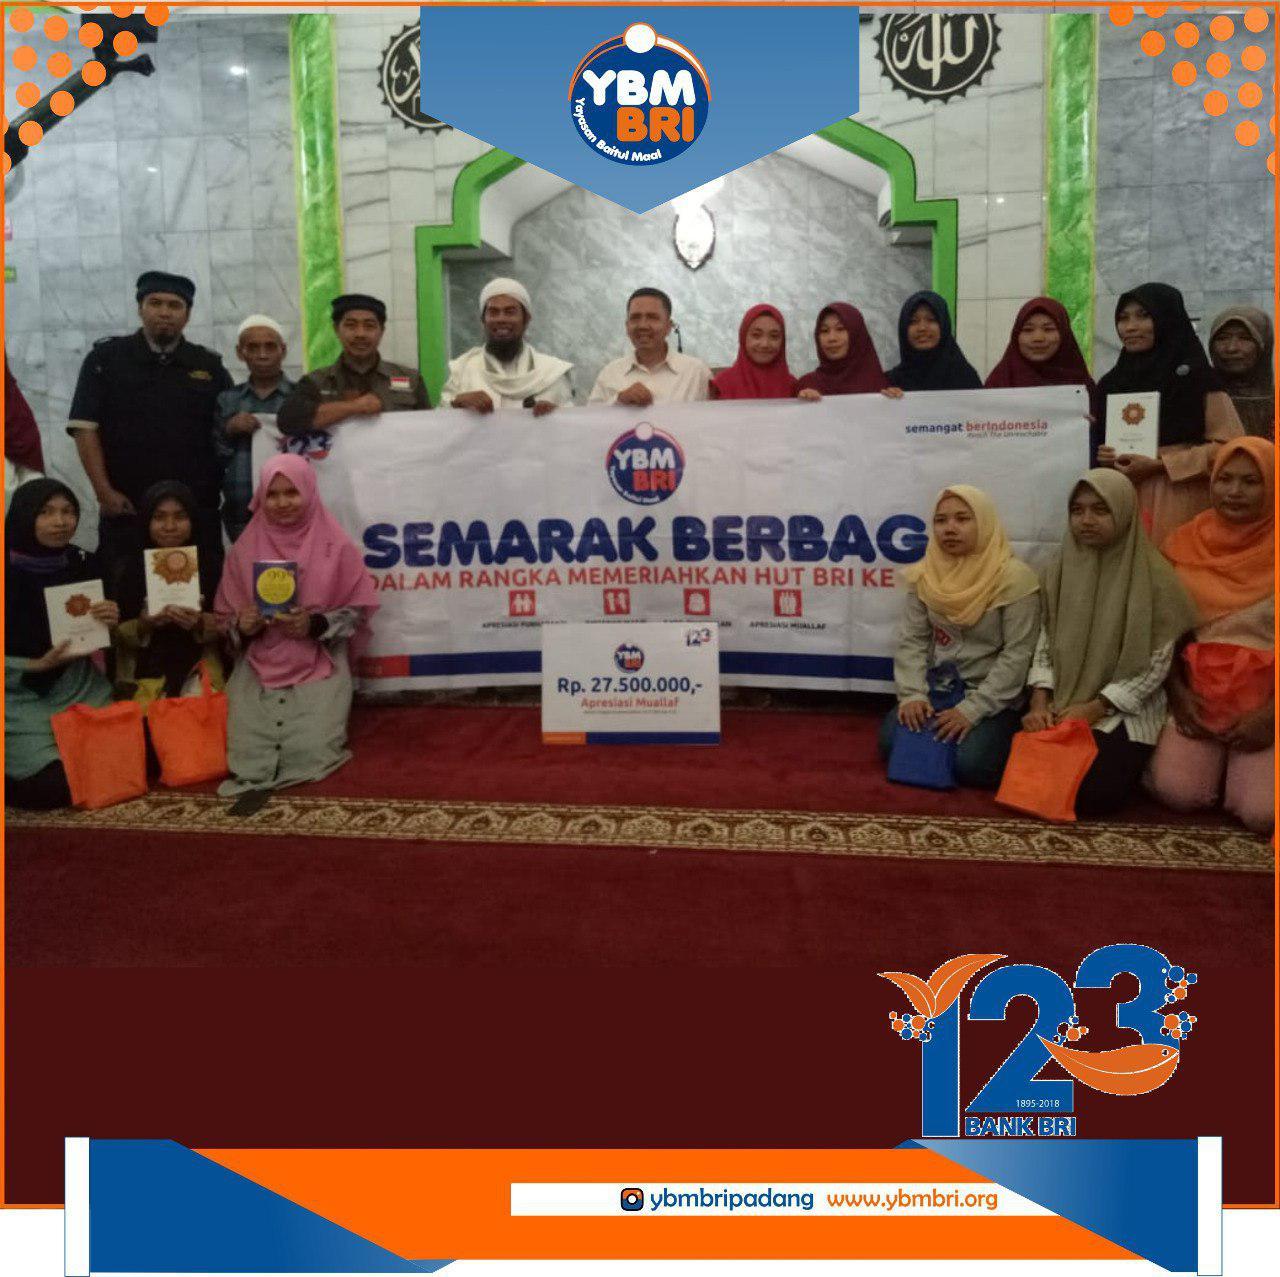 Ybm Bri Kanwil Padang Peduli Muallaf Mentawai Yayasan Baitul Maal